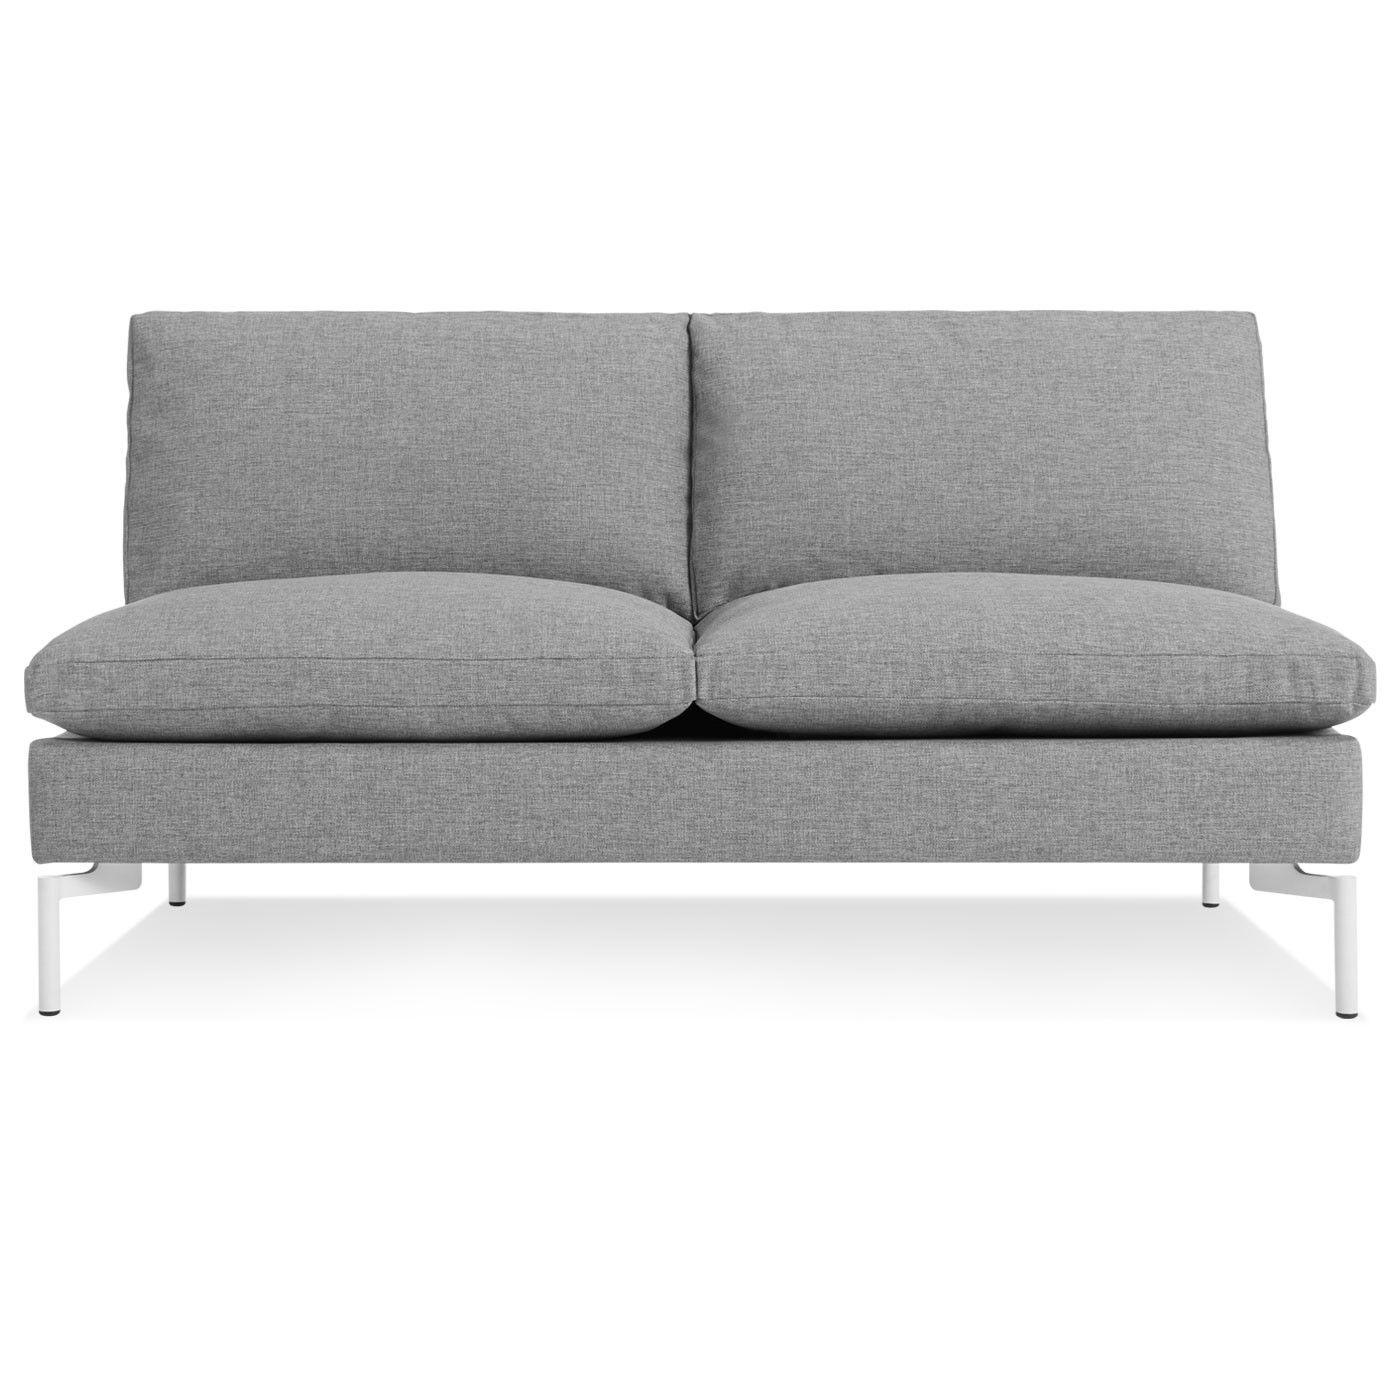 The New Standard Armless Sofa, Nixon Blue / White Love